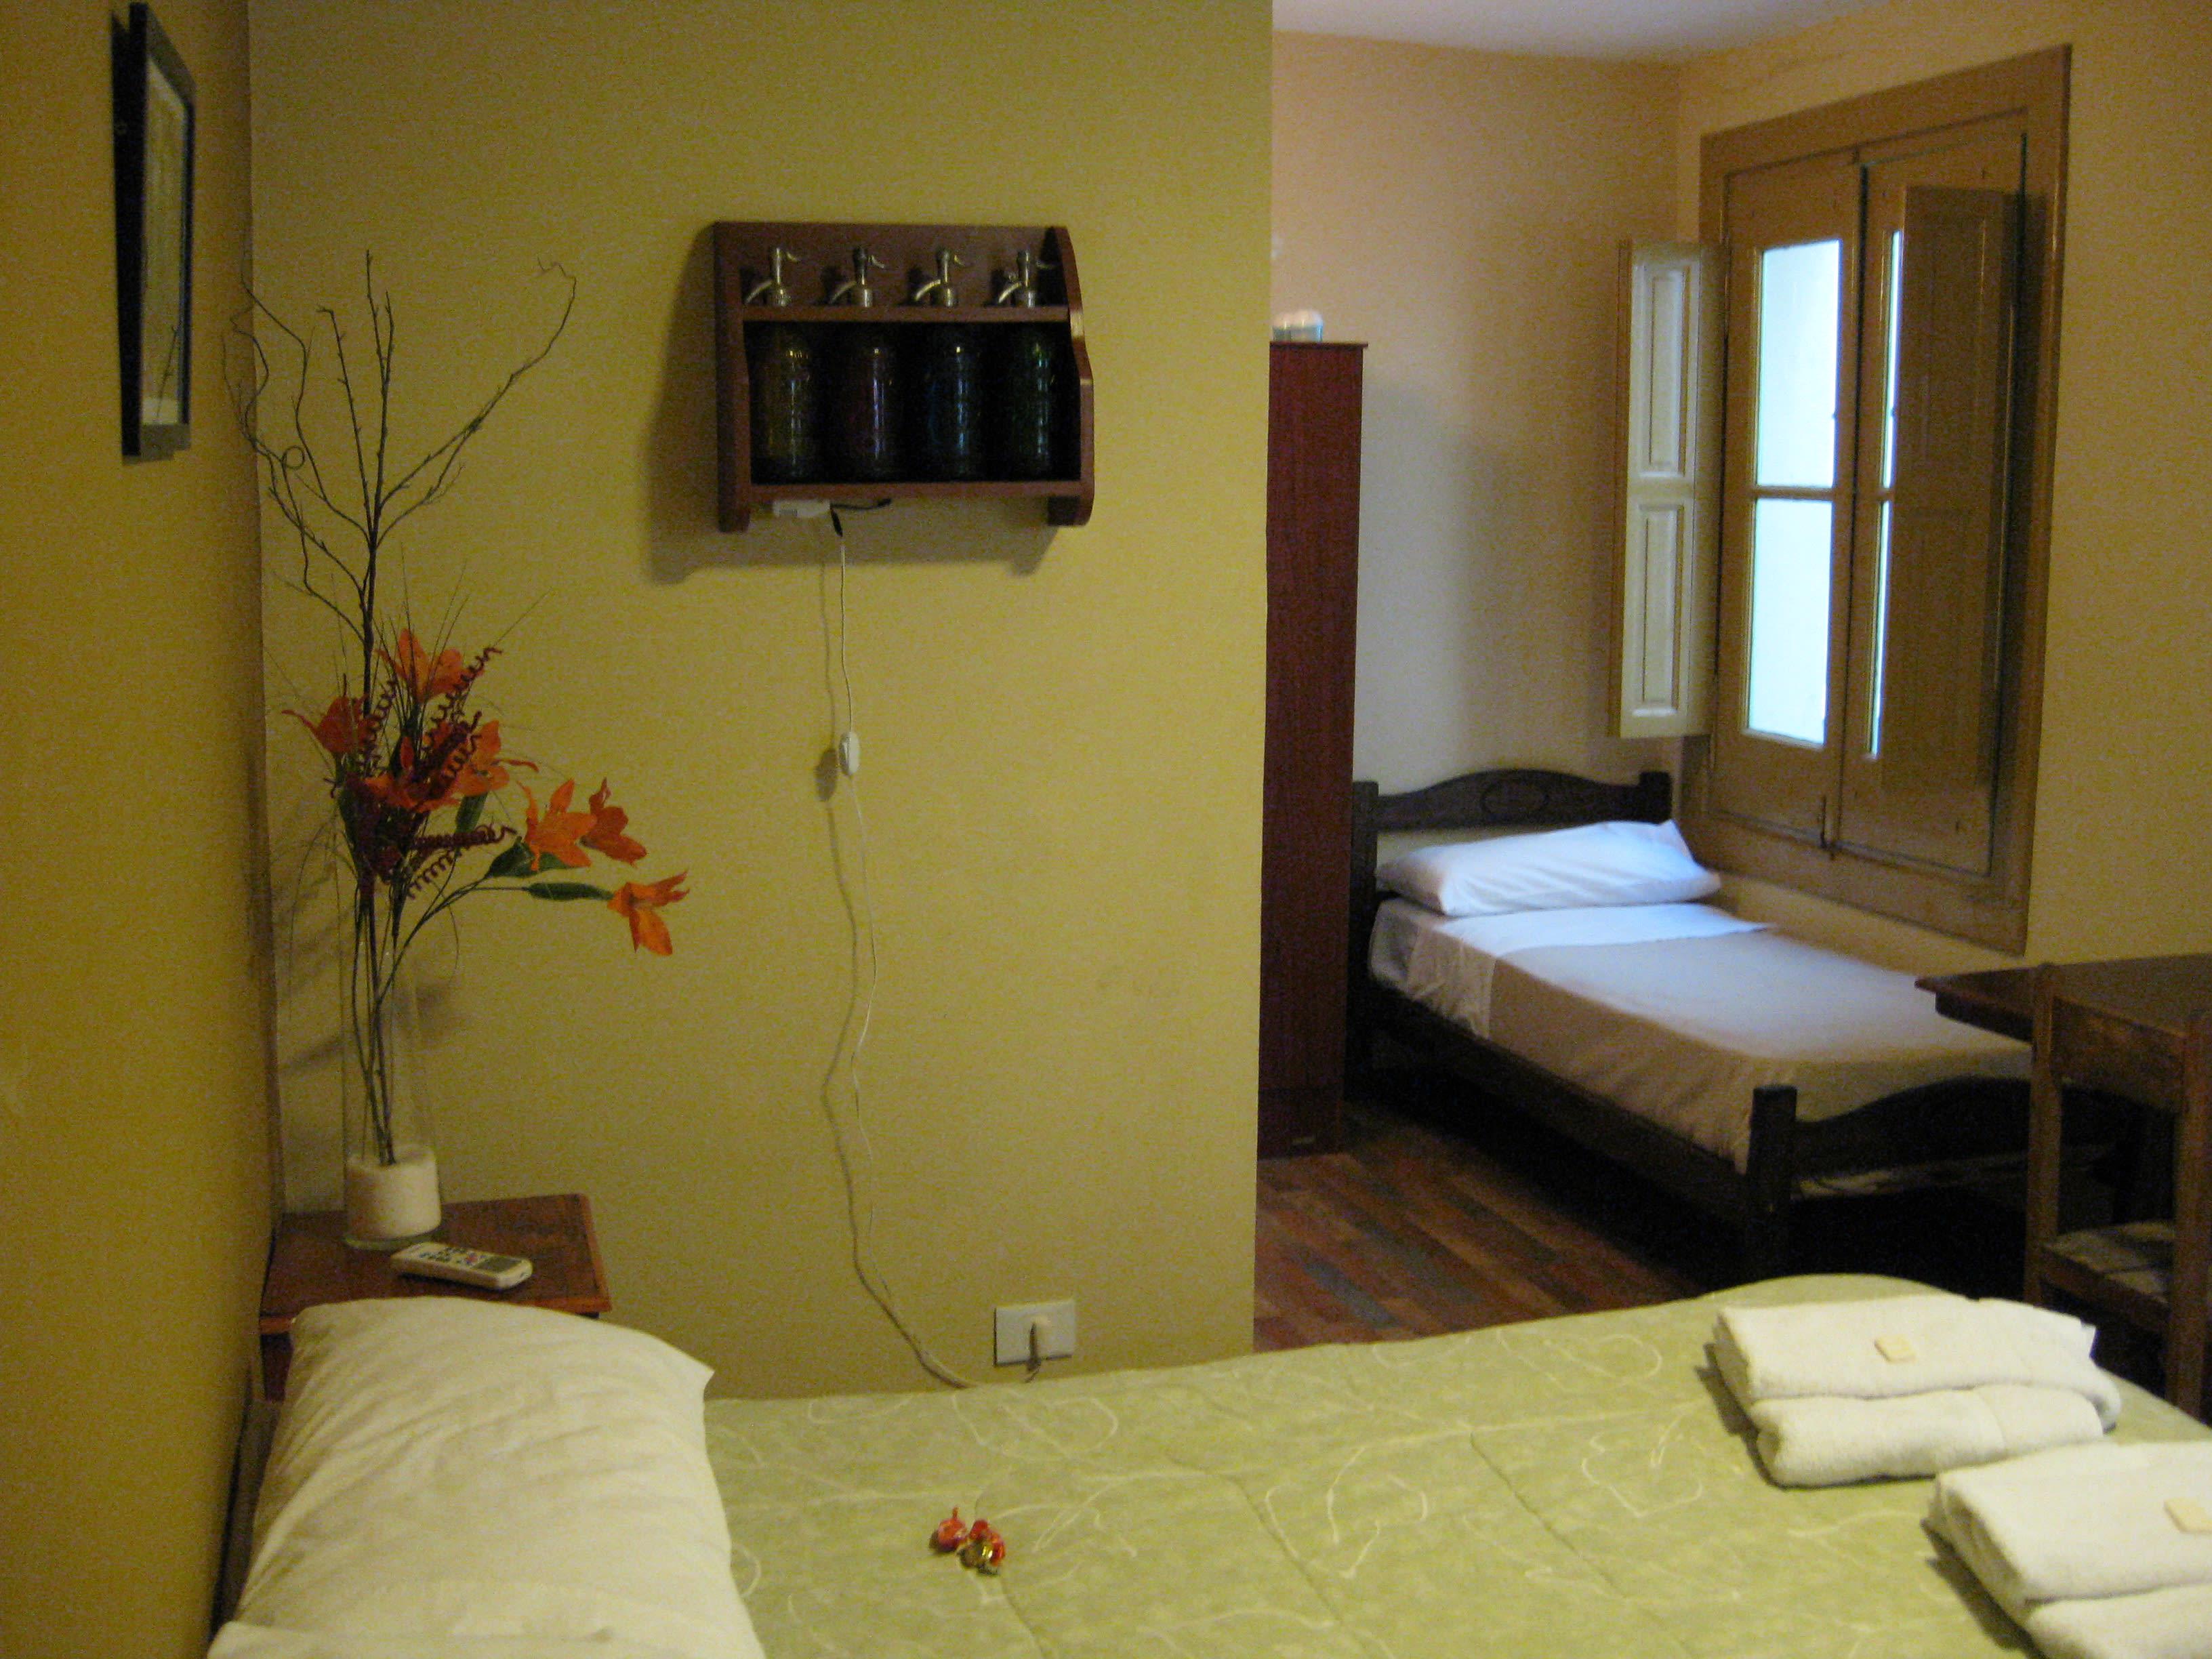 HOSTEL - Sabatico Travelers Hostel